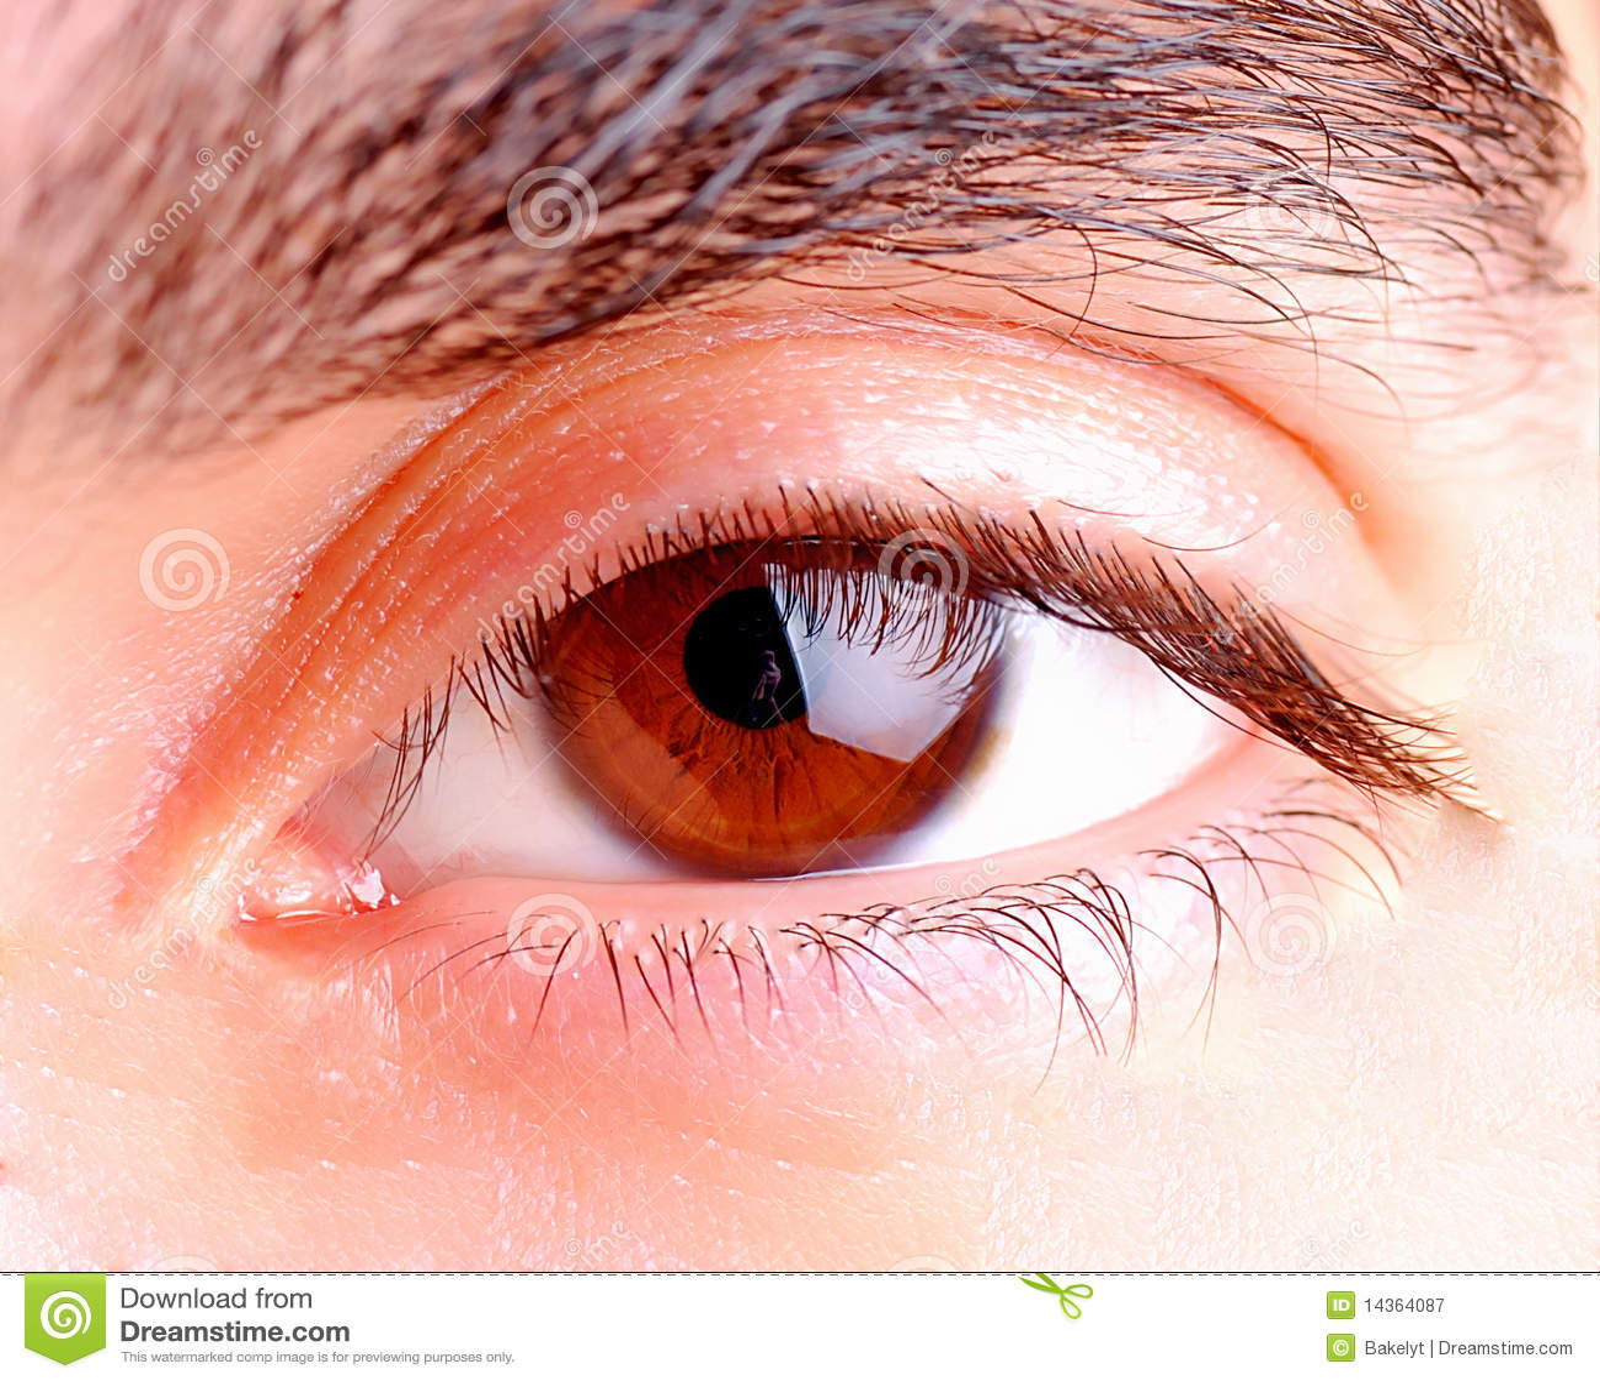 Human Eye Royalty Free Stock Photography Image 14364087